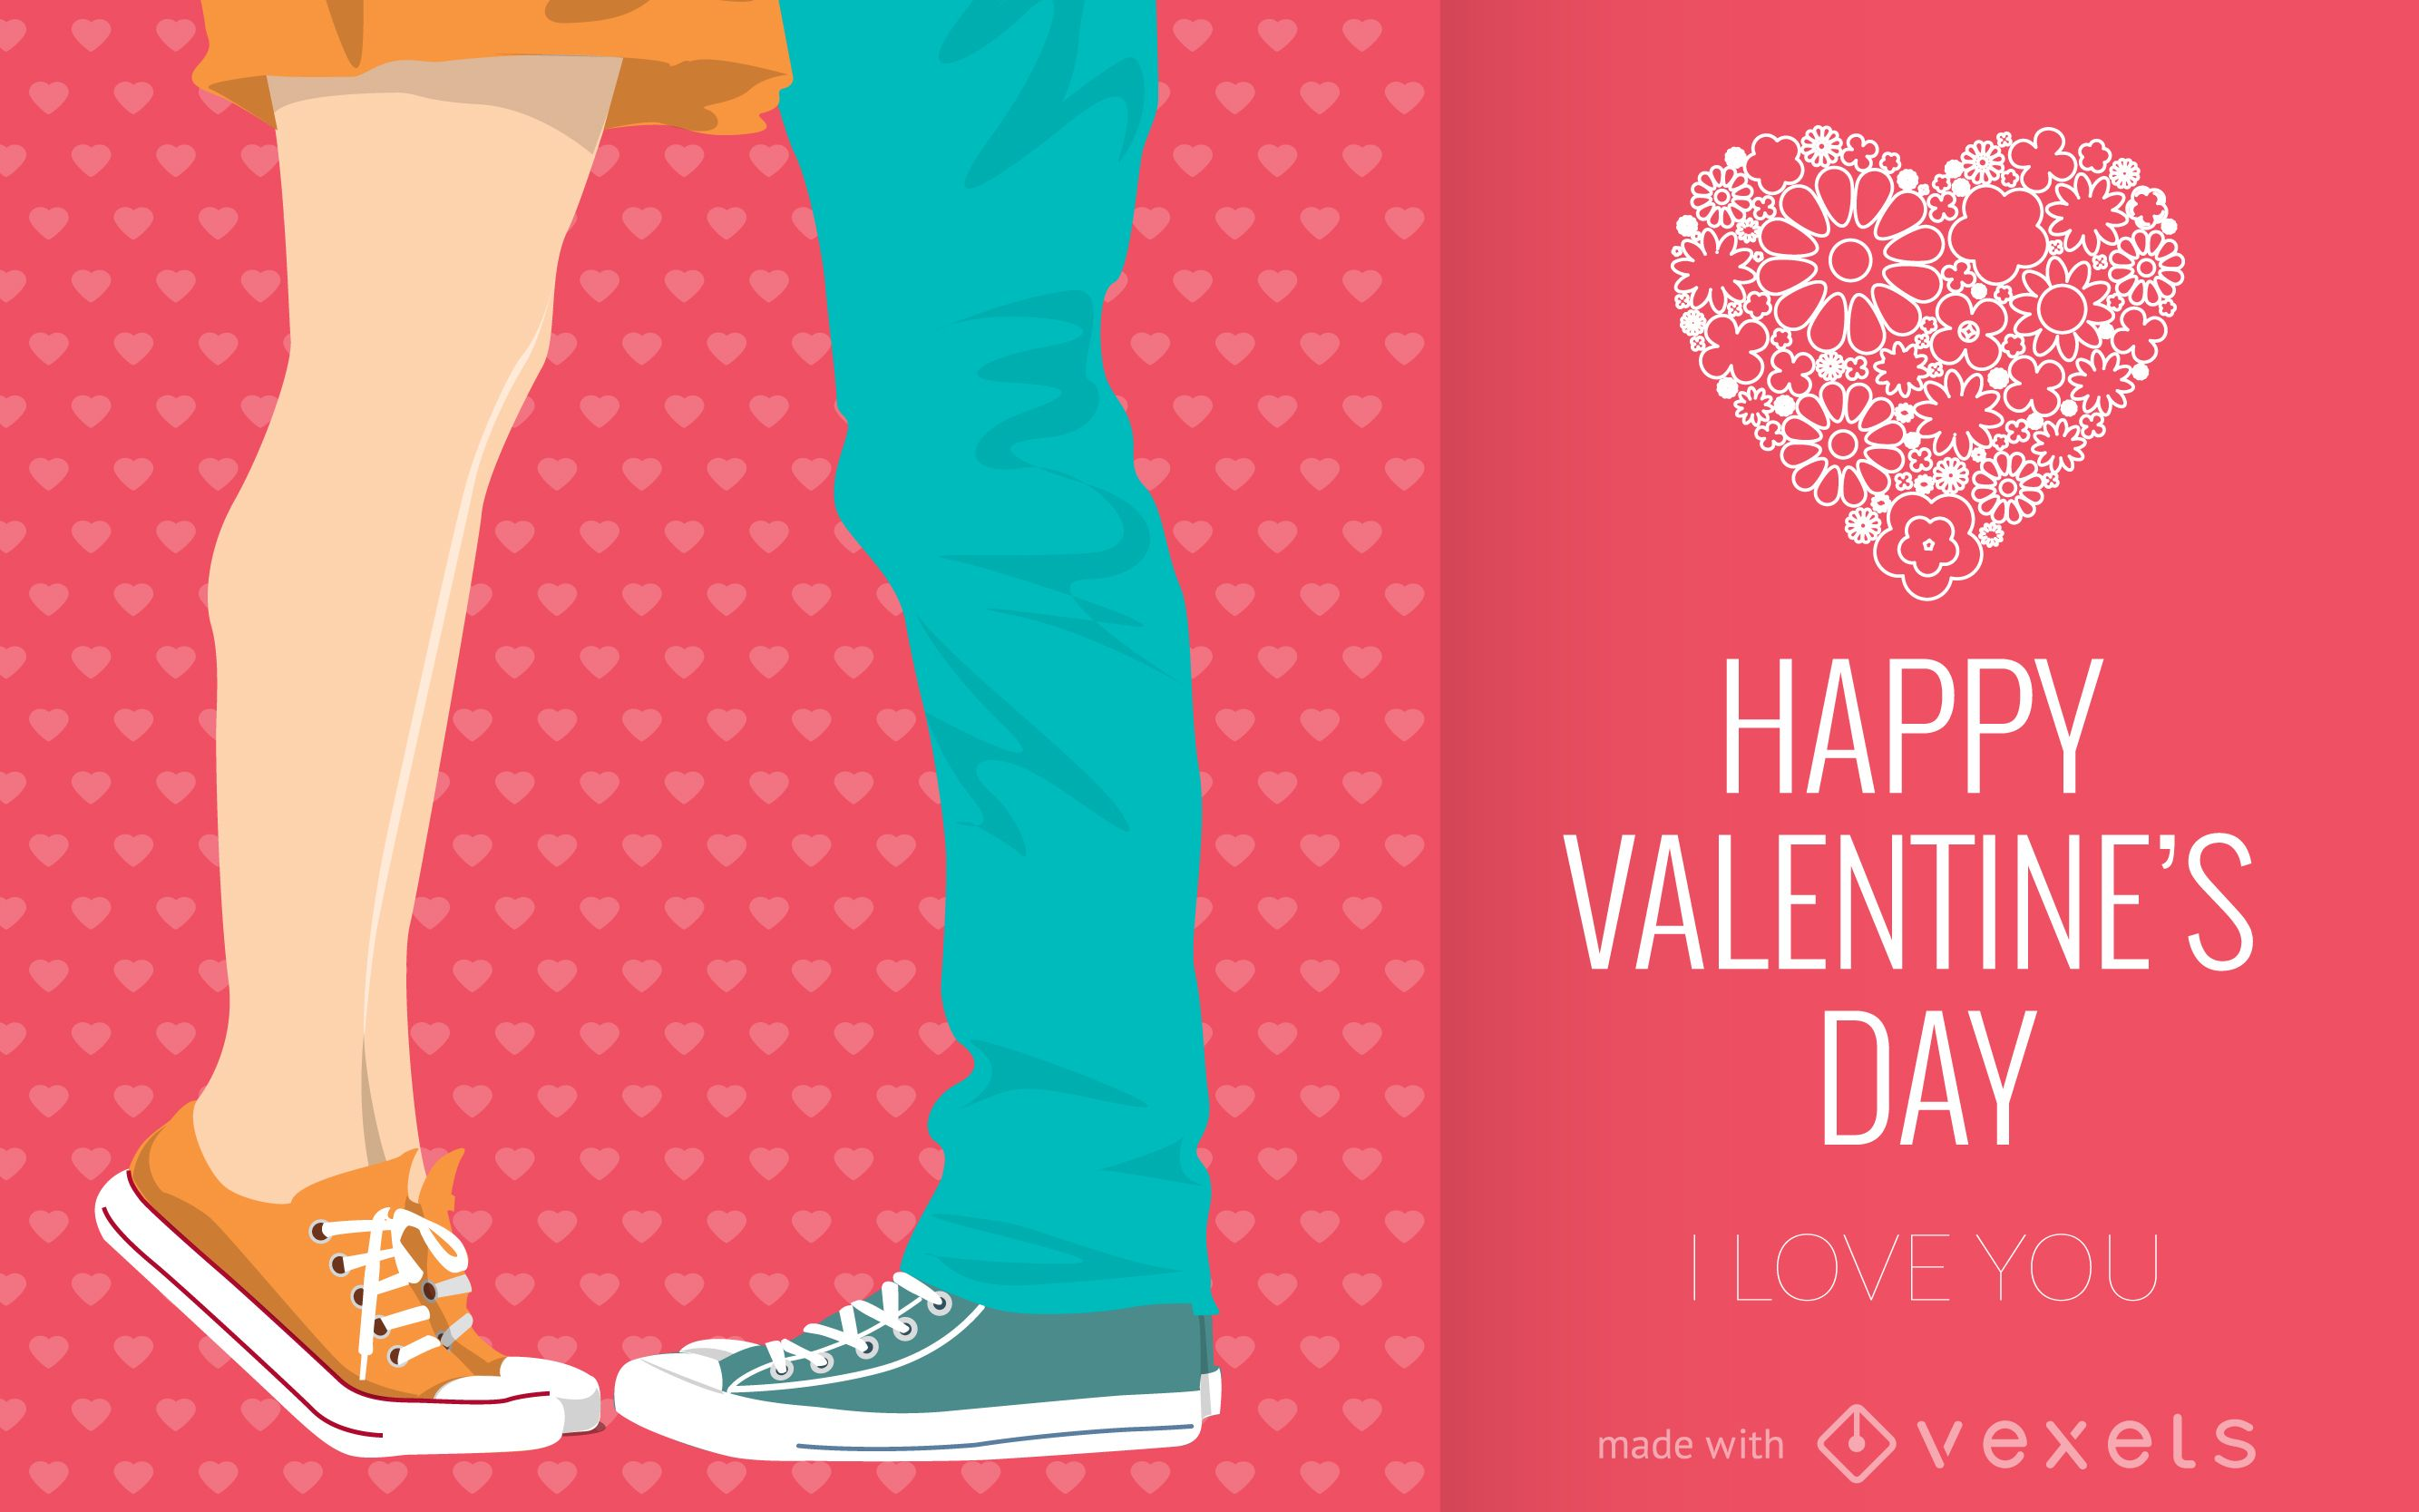 Illustrated Valentine's Day card maker